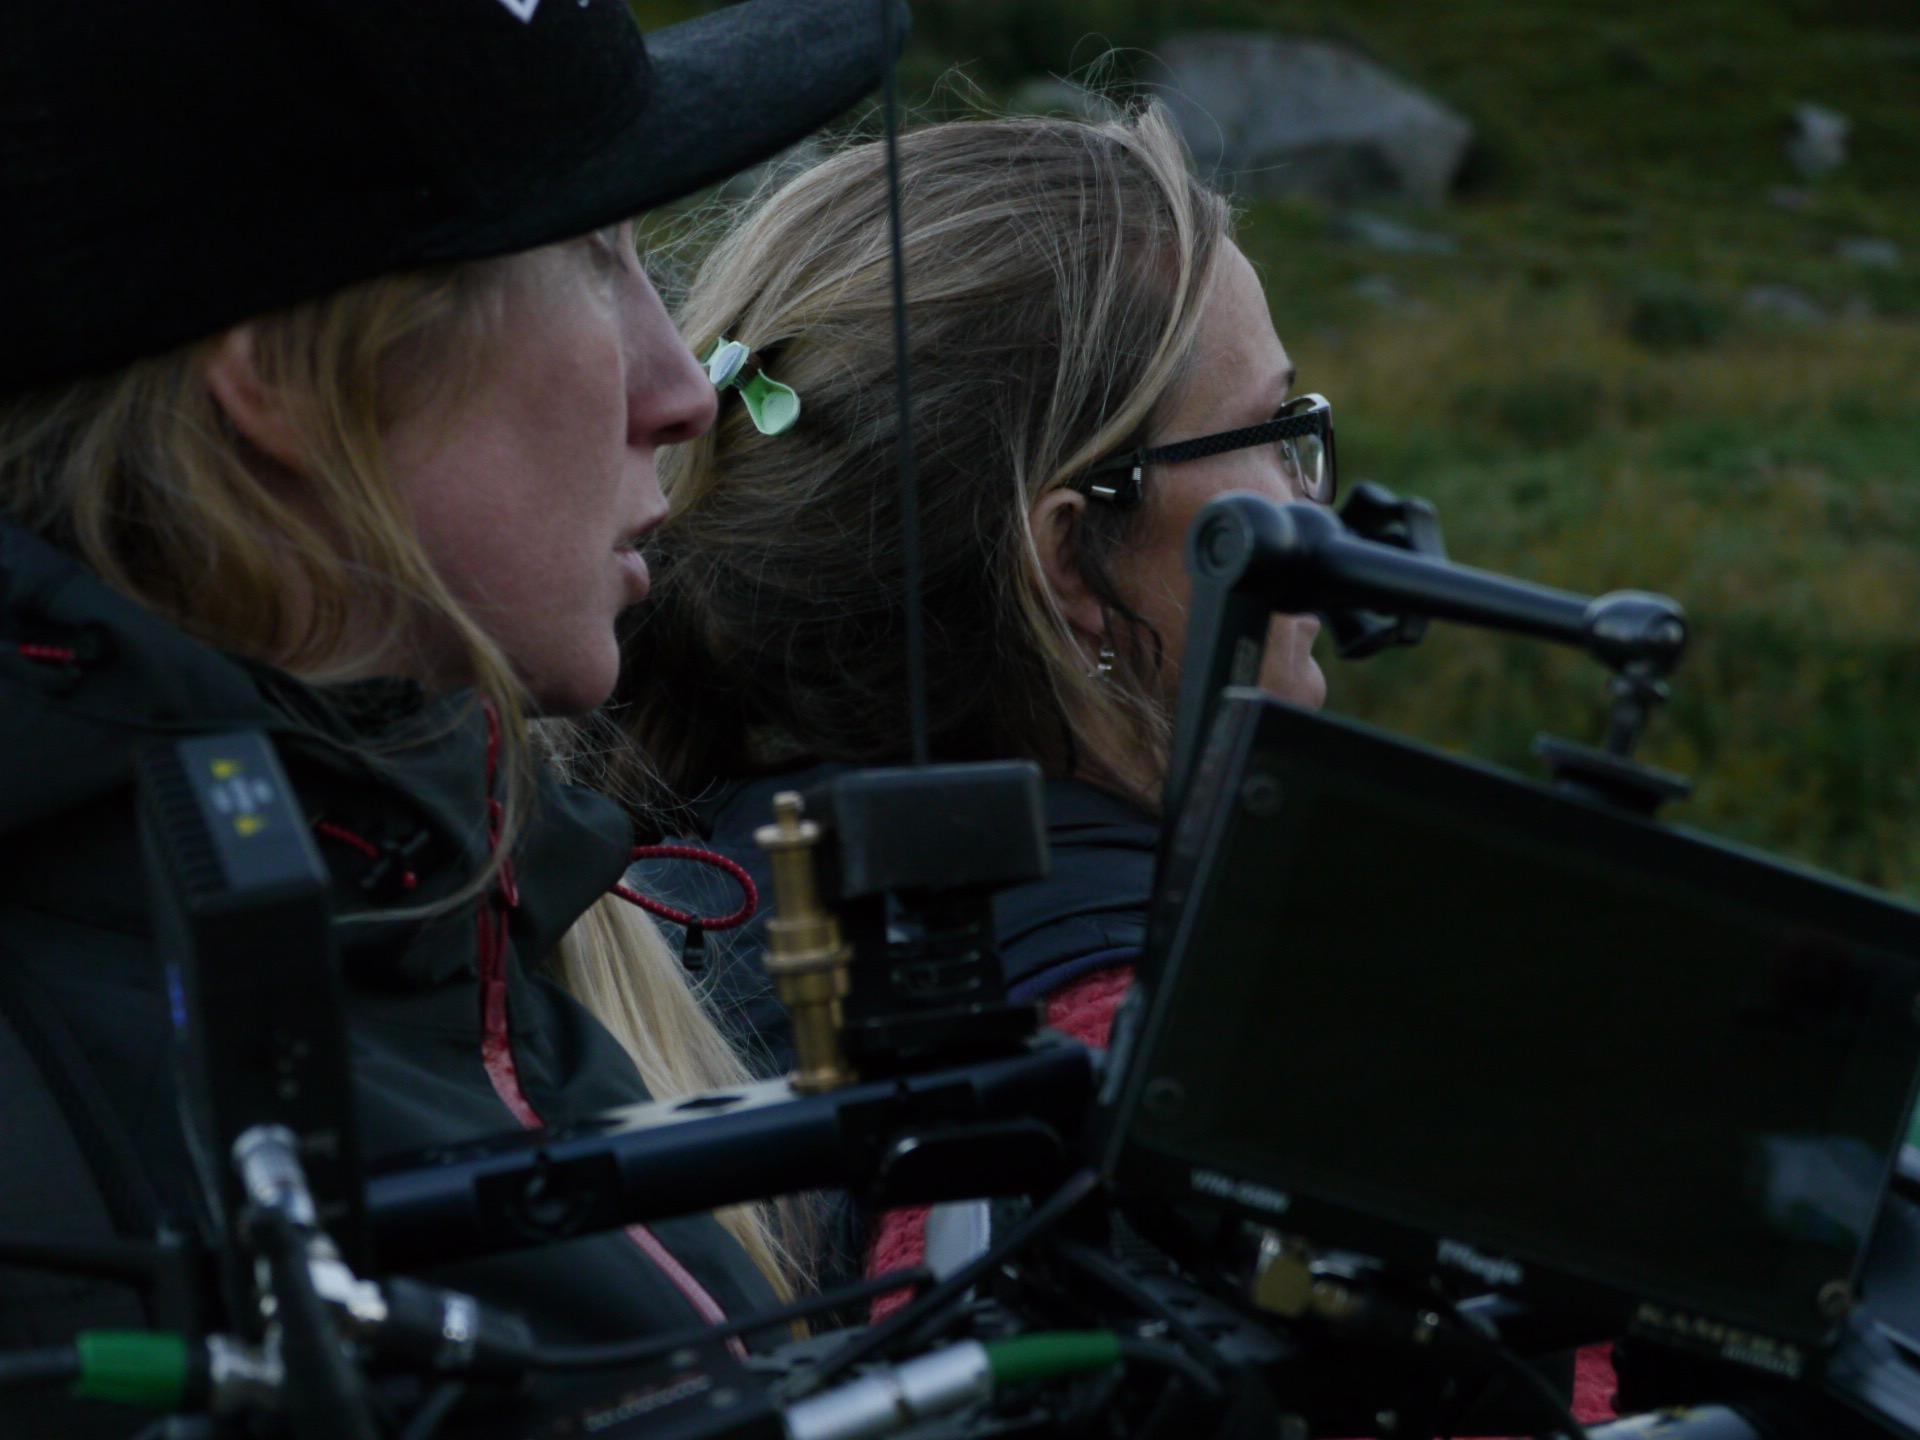 Fotograf  Annika Summerson og regissør Marianne Ulrichsen.